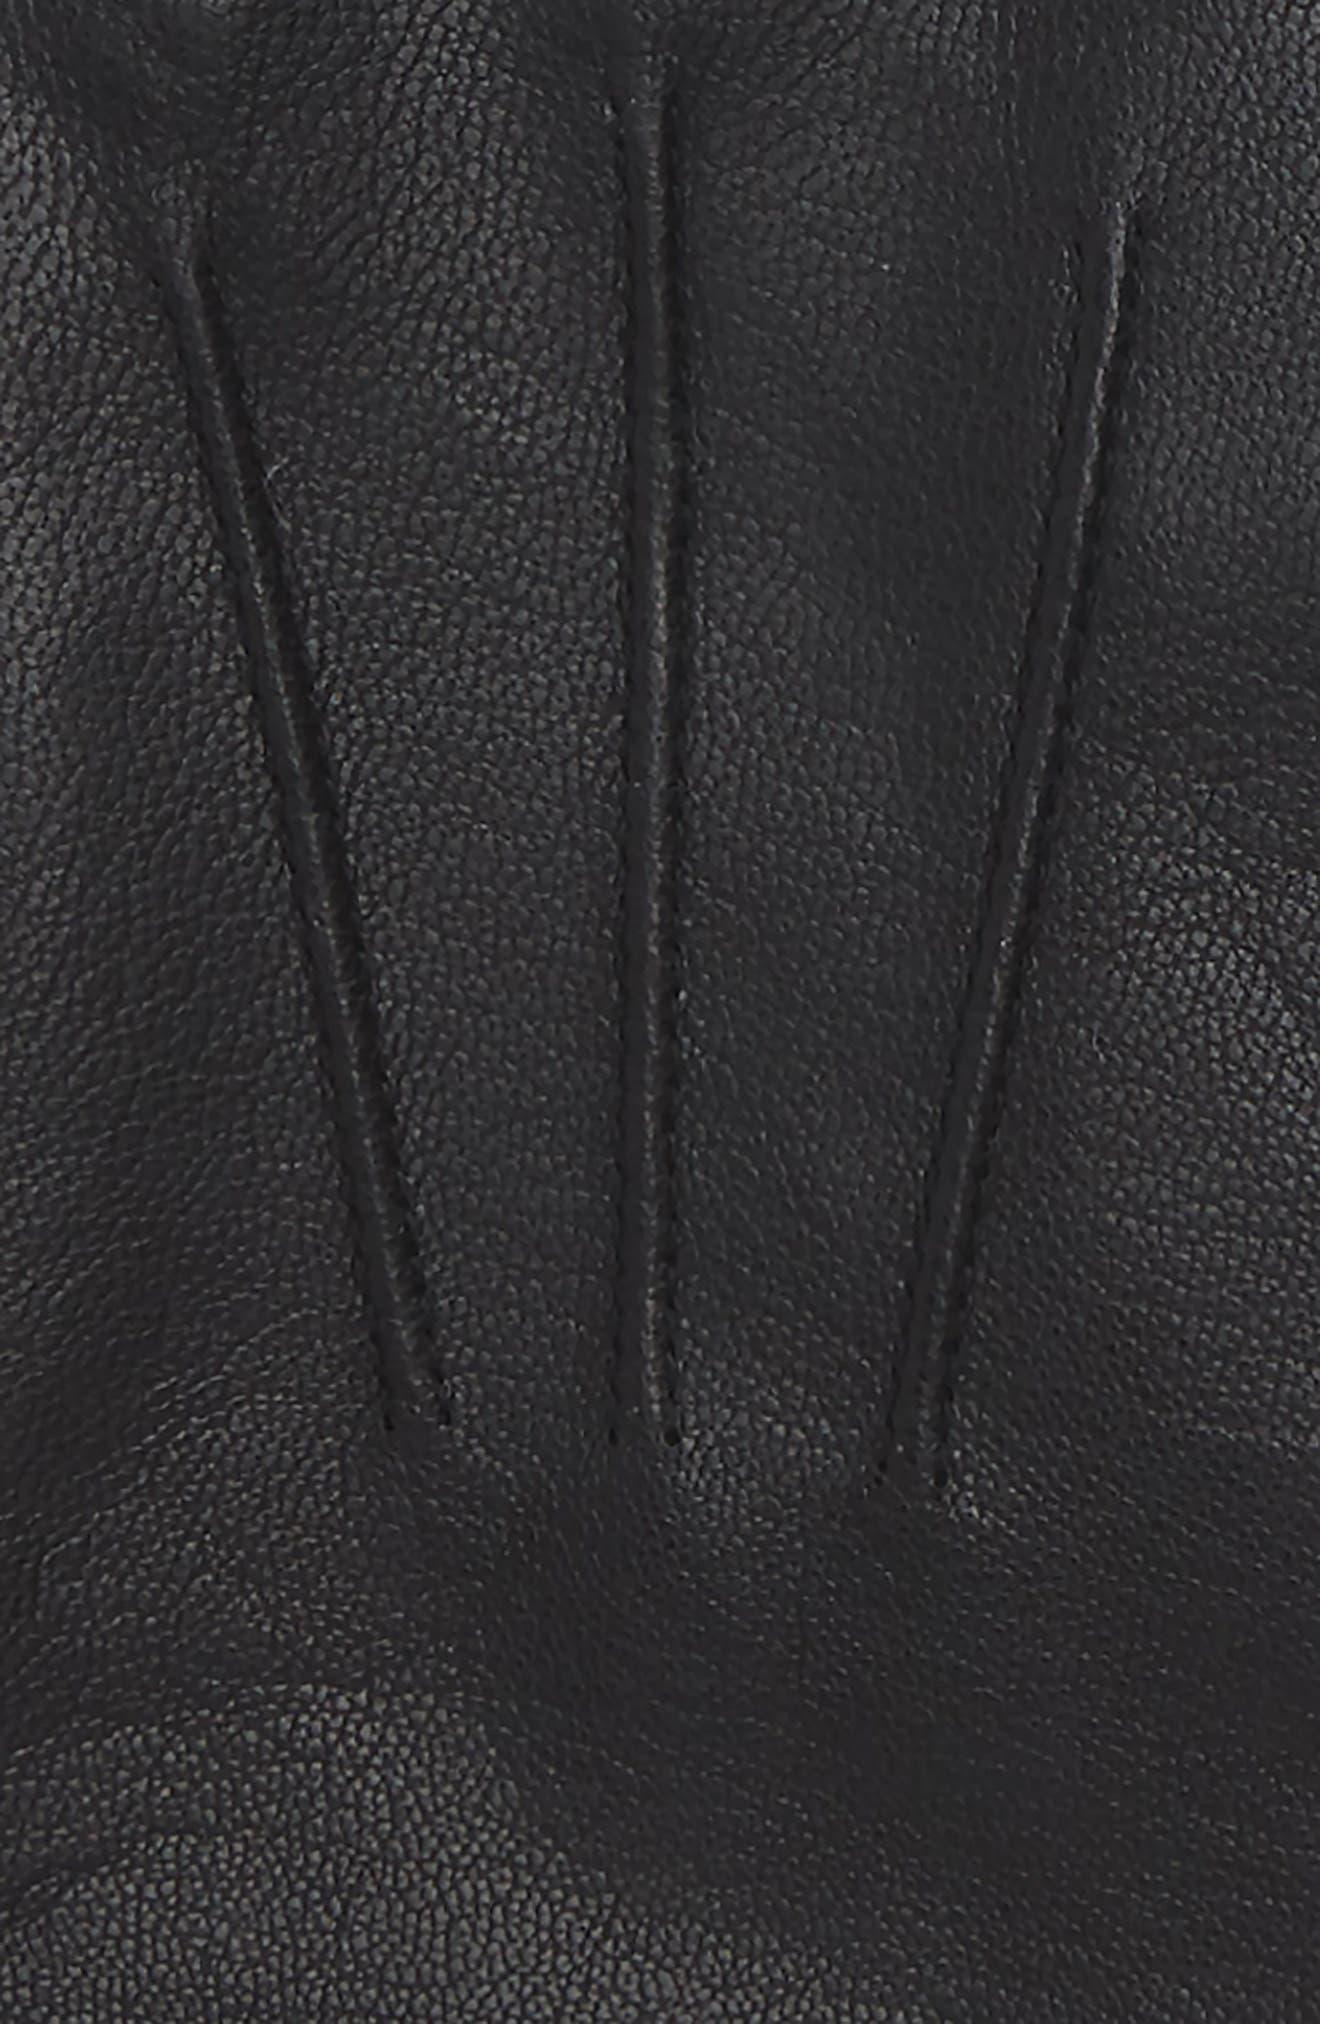 Hainz Leather Gloves,                             Alternate thumbnail 2, color,                             001